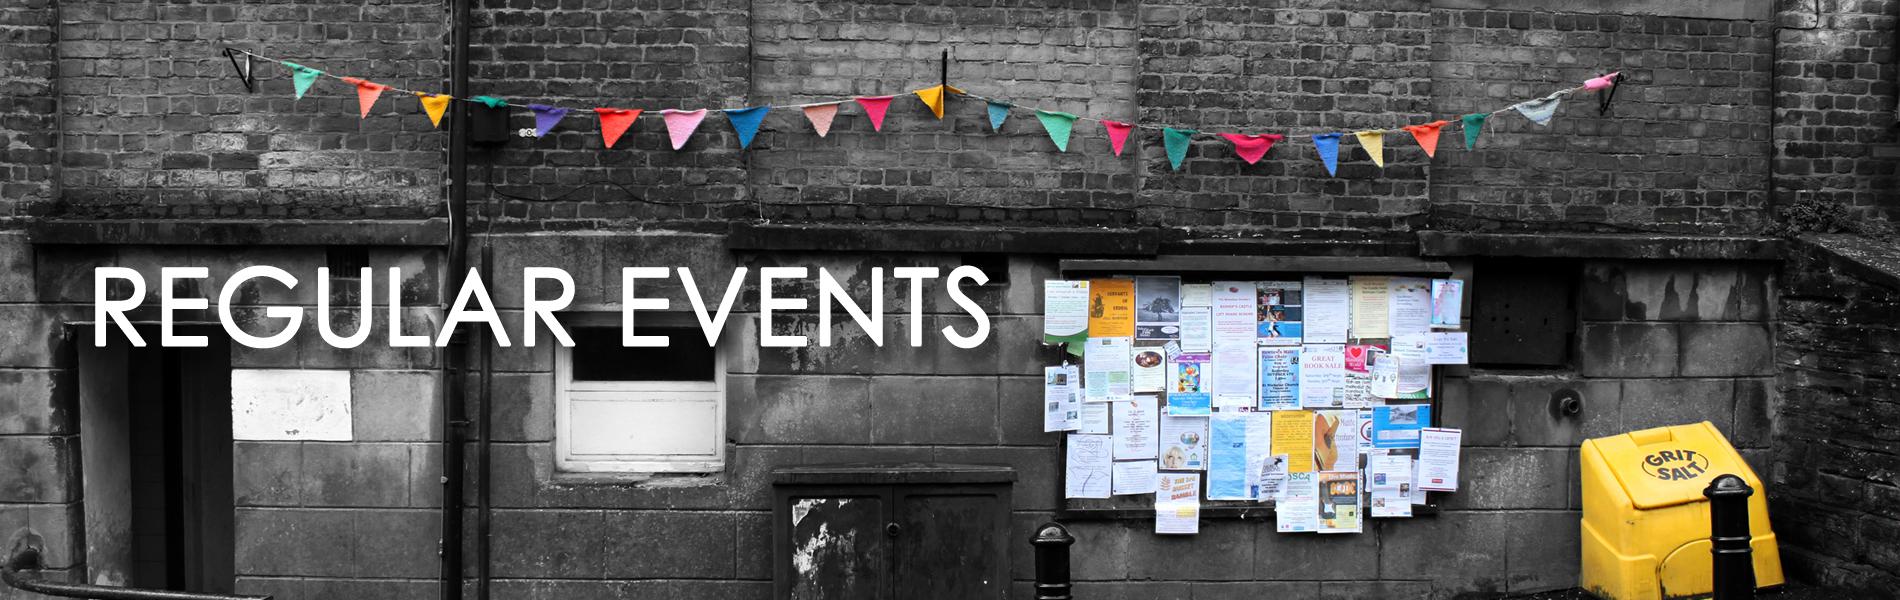 regular events